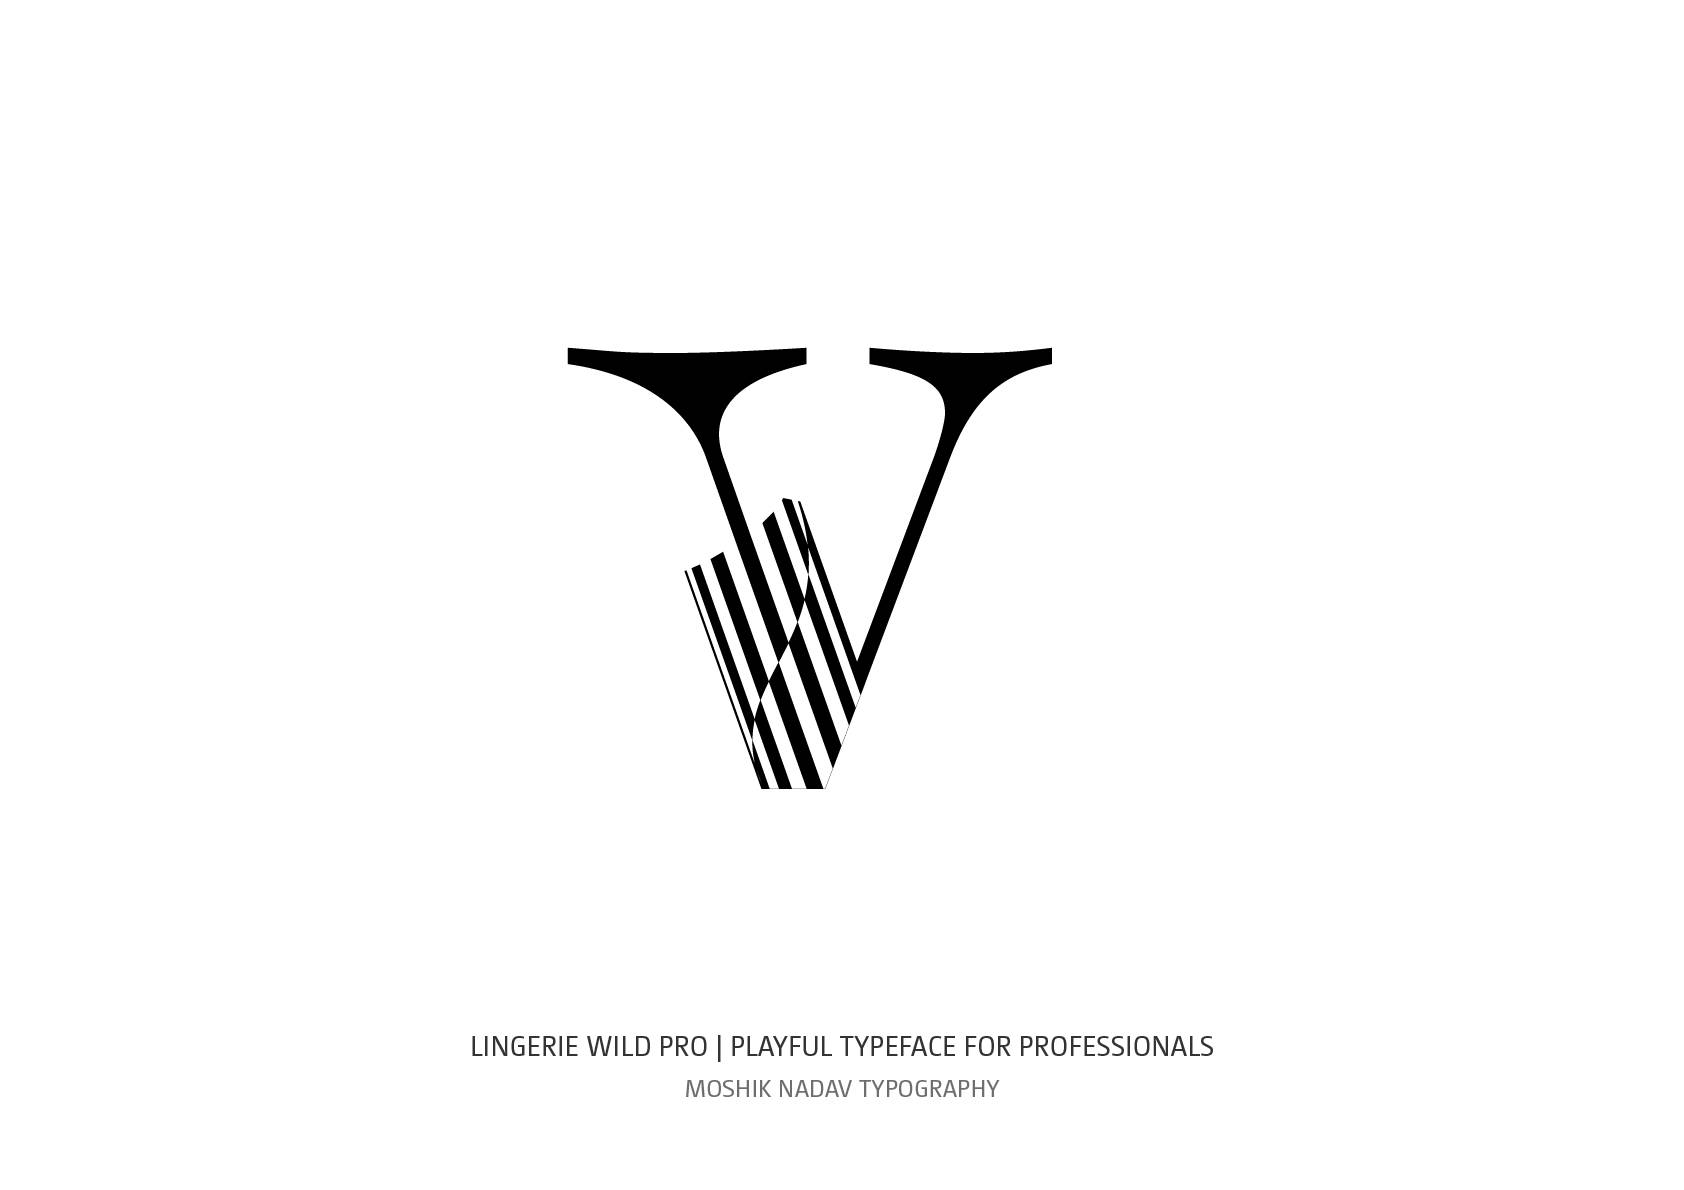 Lingerie Wild Pro Typeface lowercase v designed by Moshik Nadav Typography NYC design studio